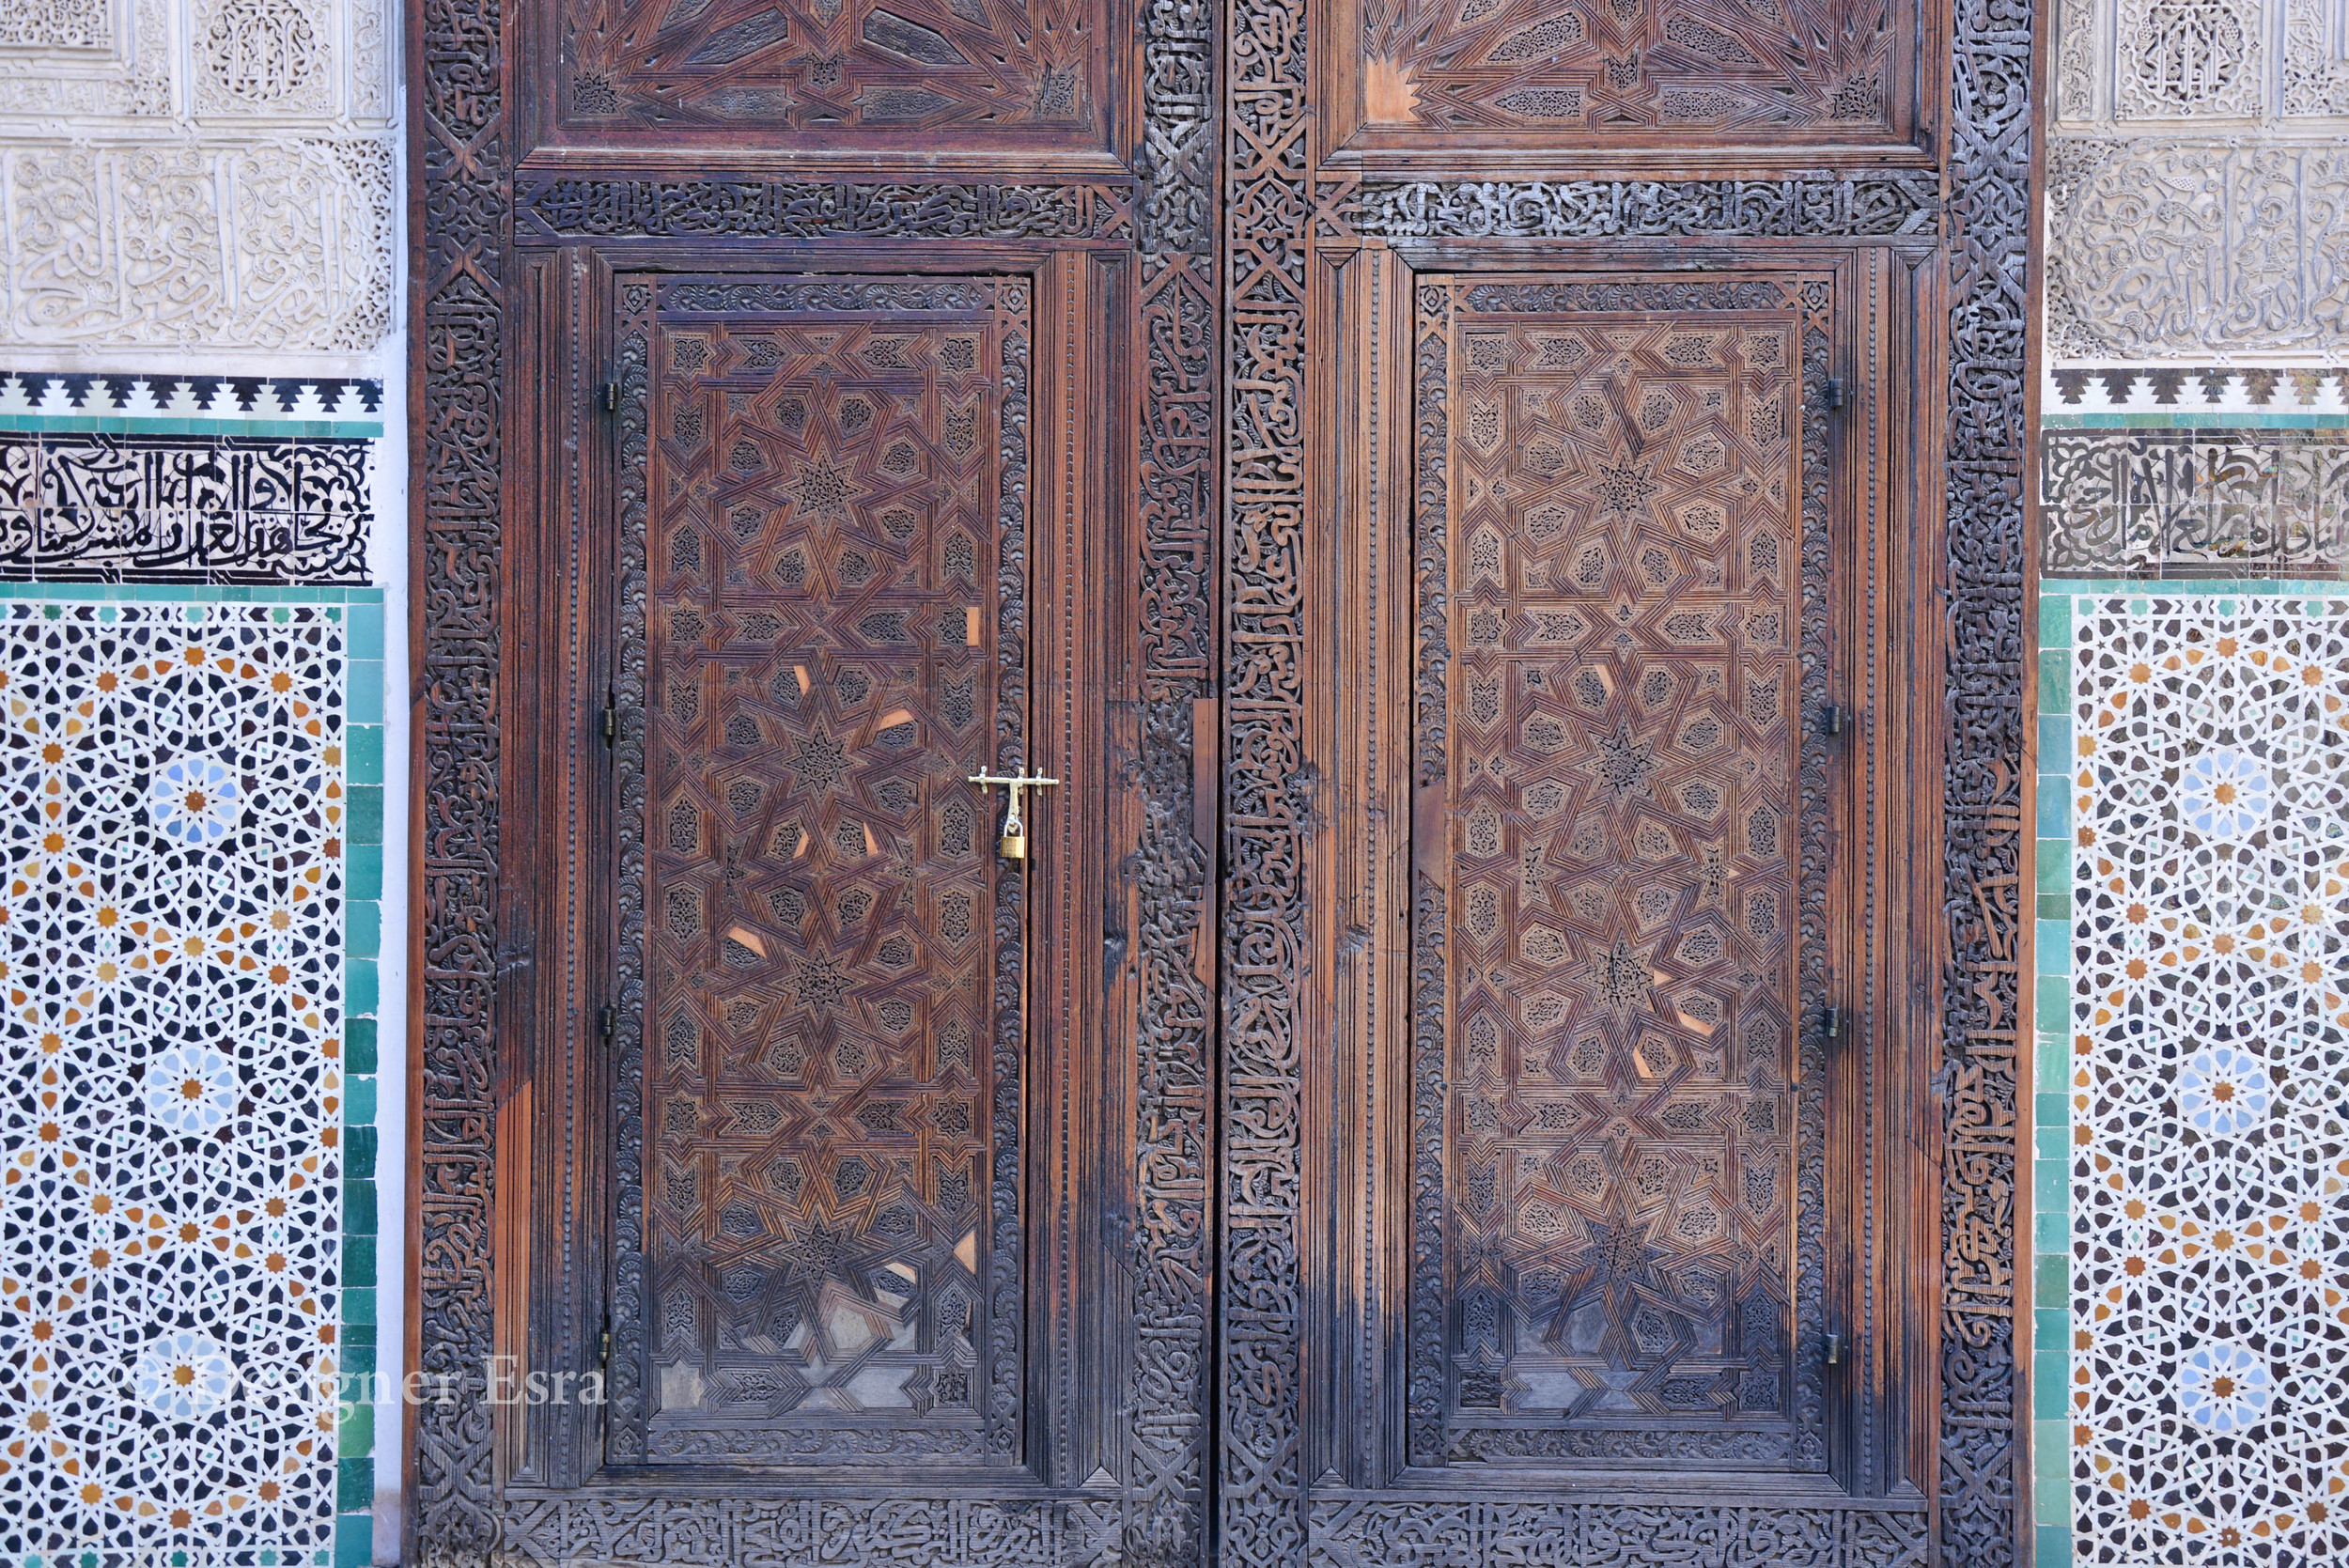 Islamic Geometric Patterns in Fez